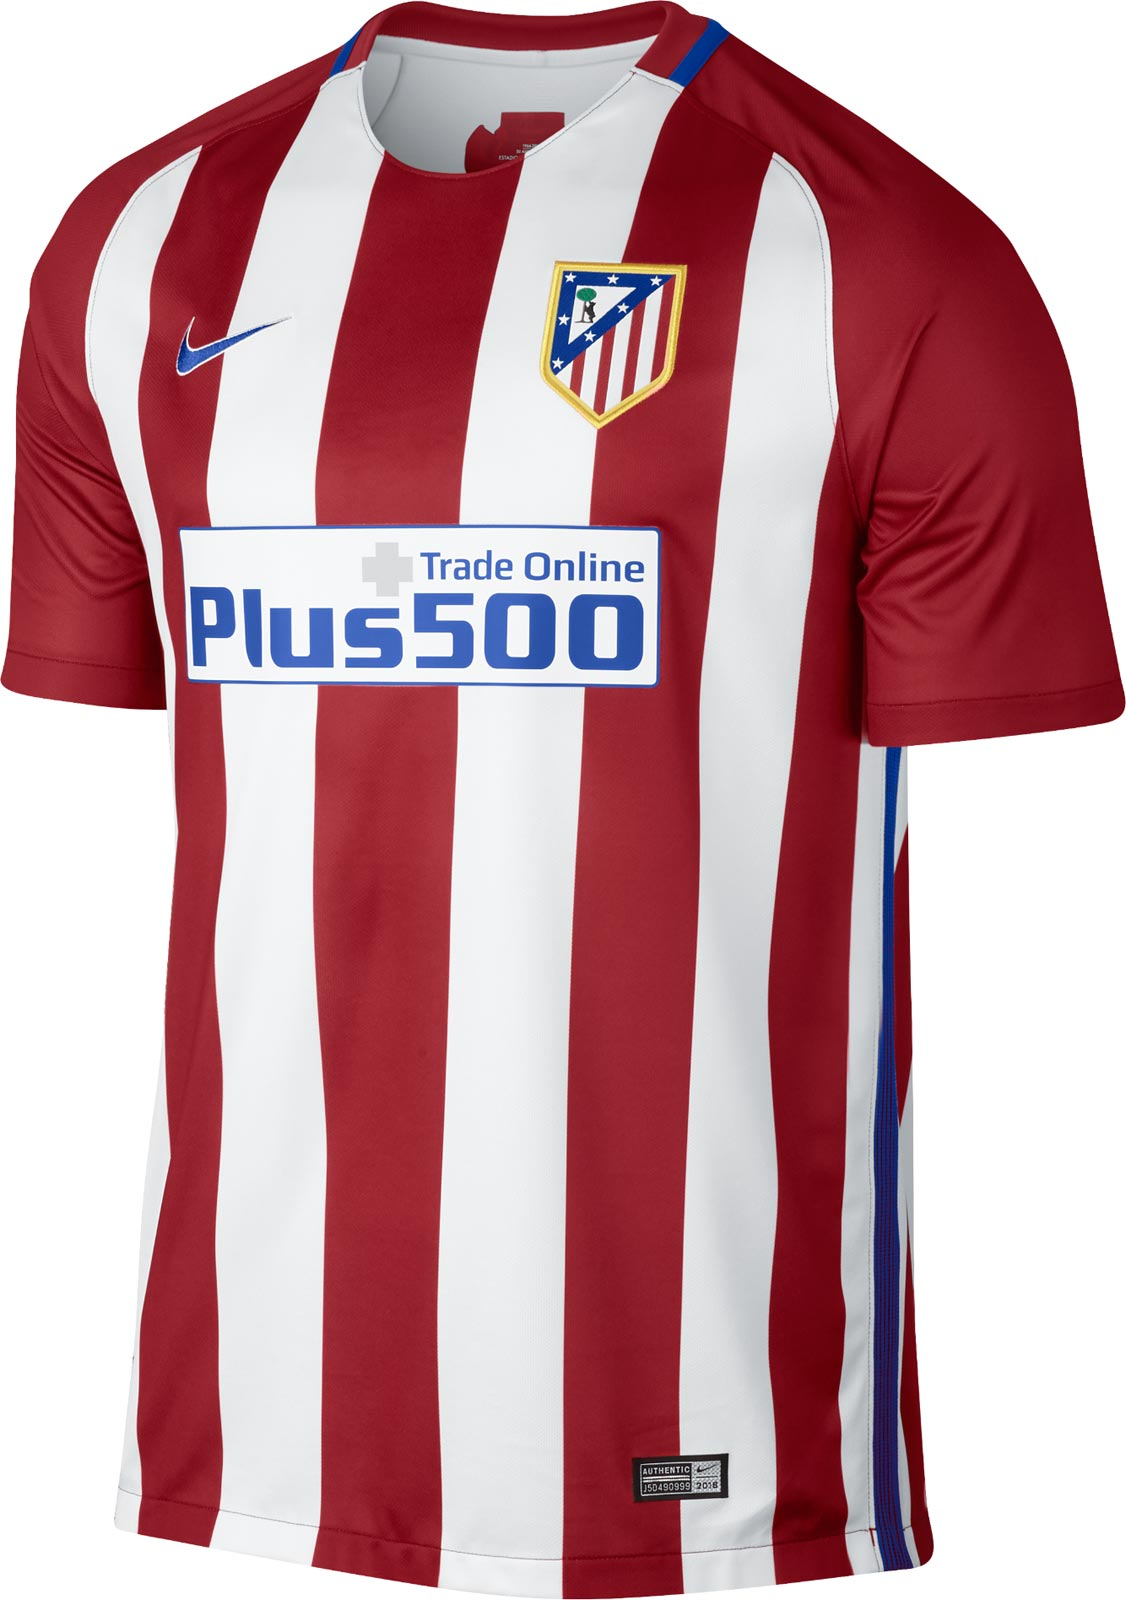 74c2f3ea2 Atletico Madrid 2016/17 Home Kit Unveiled